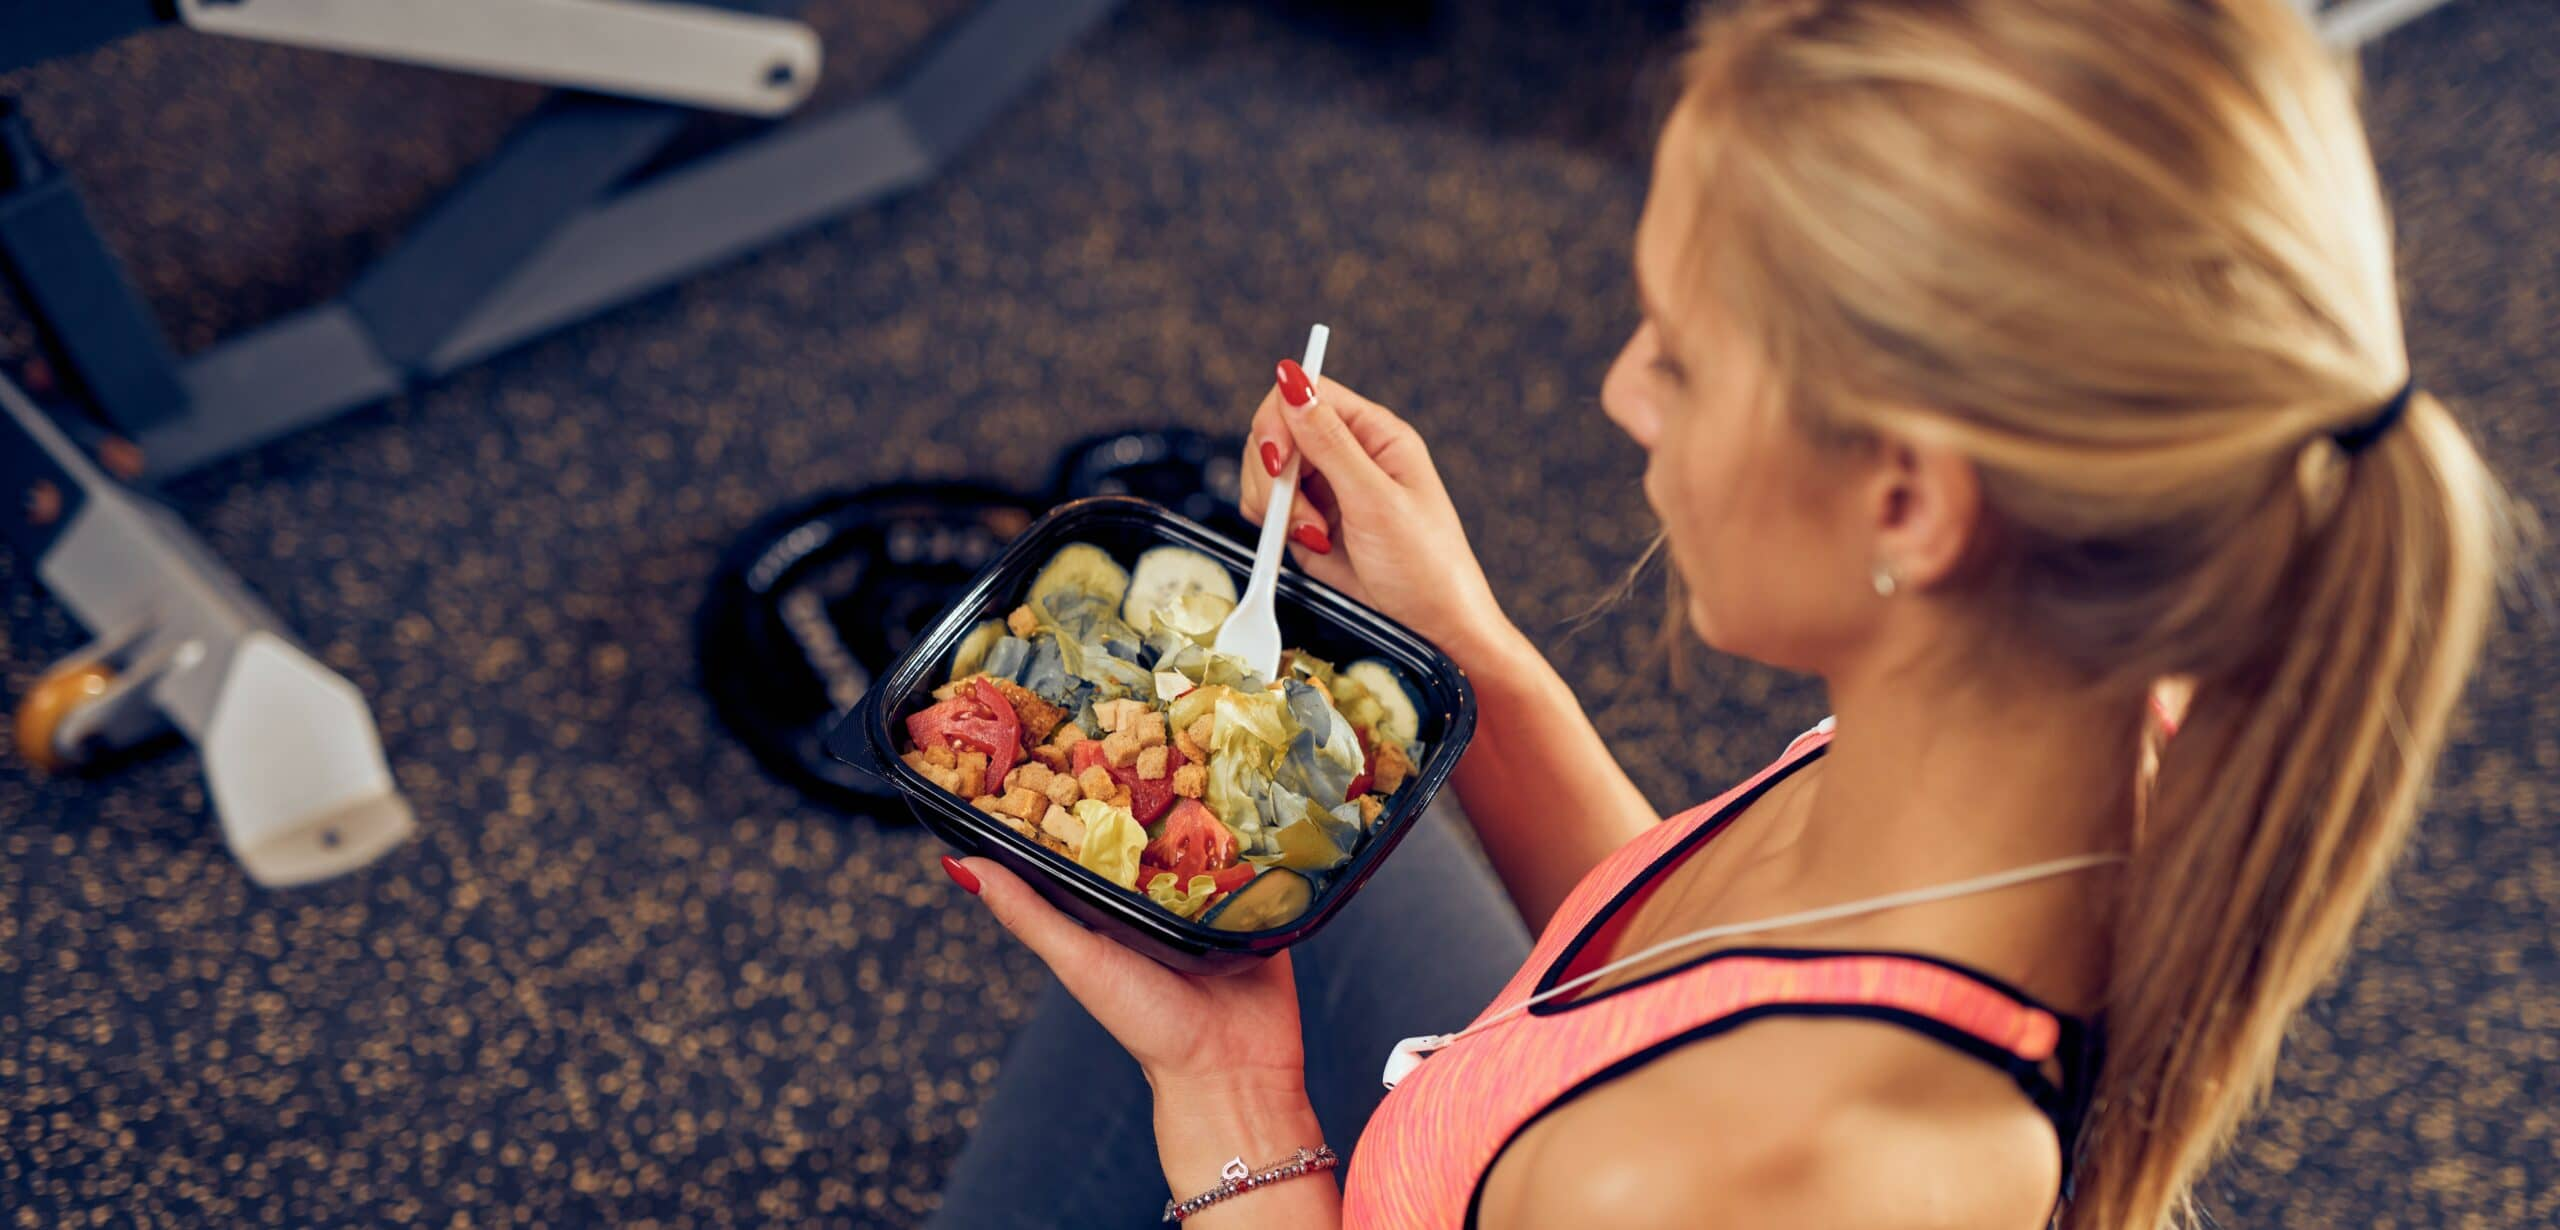 mangiare carboidrati post workout